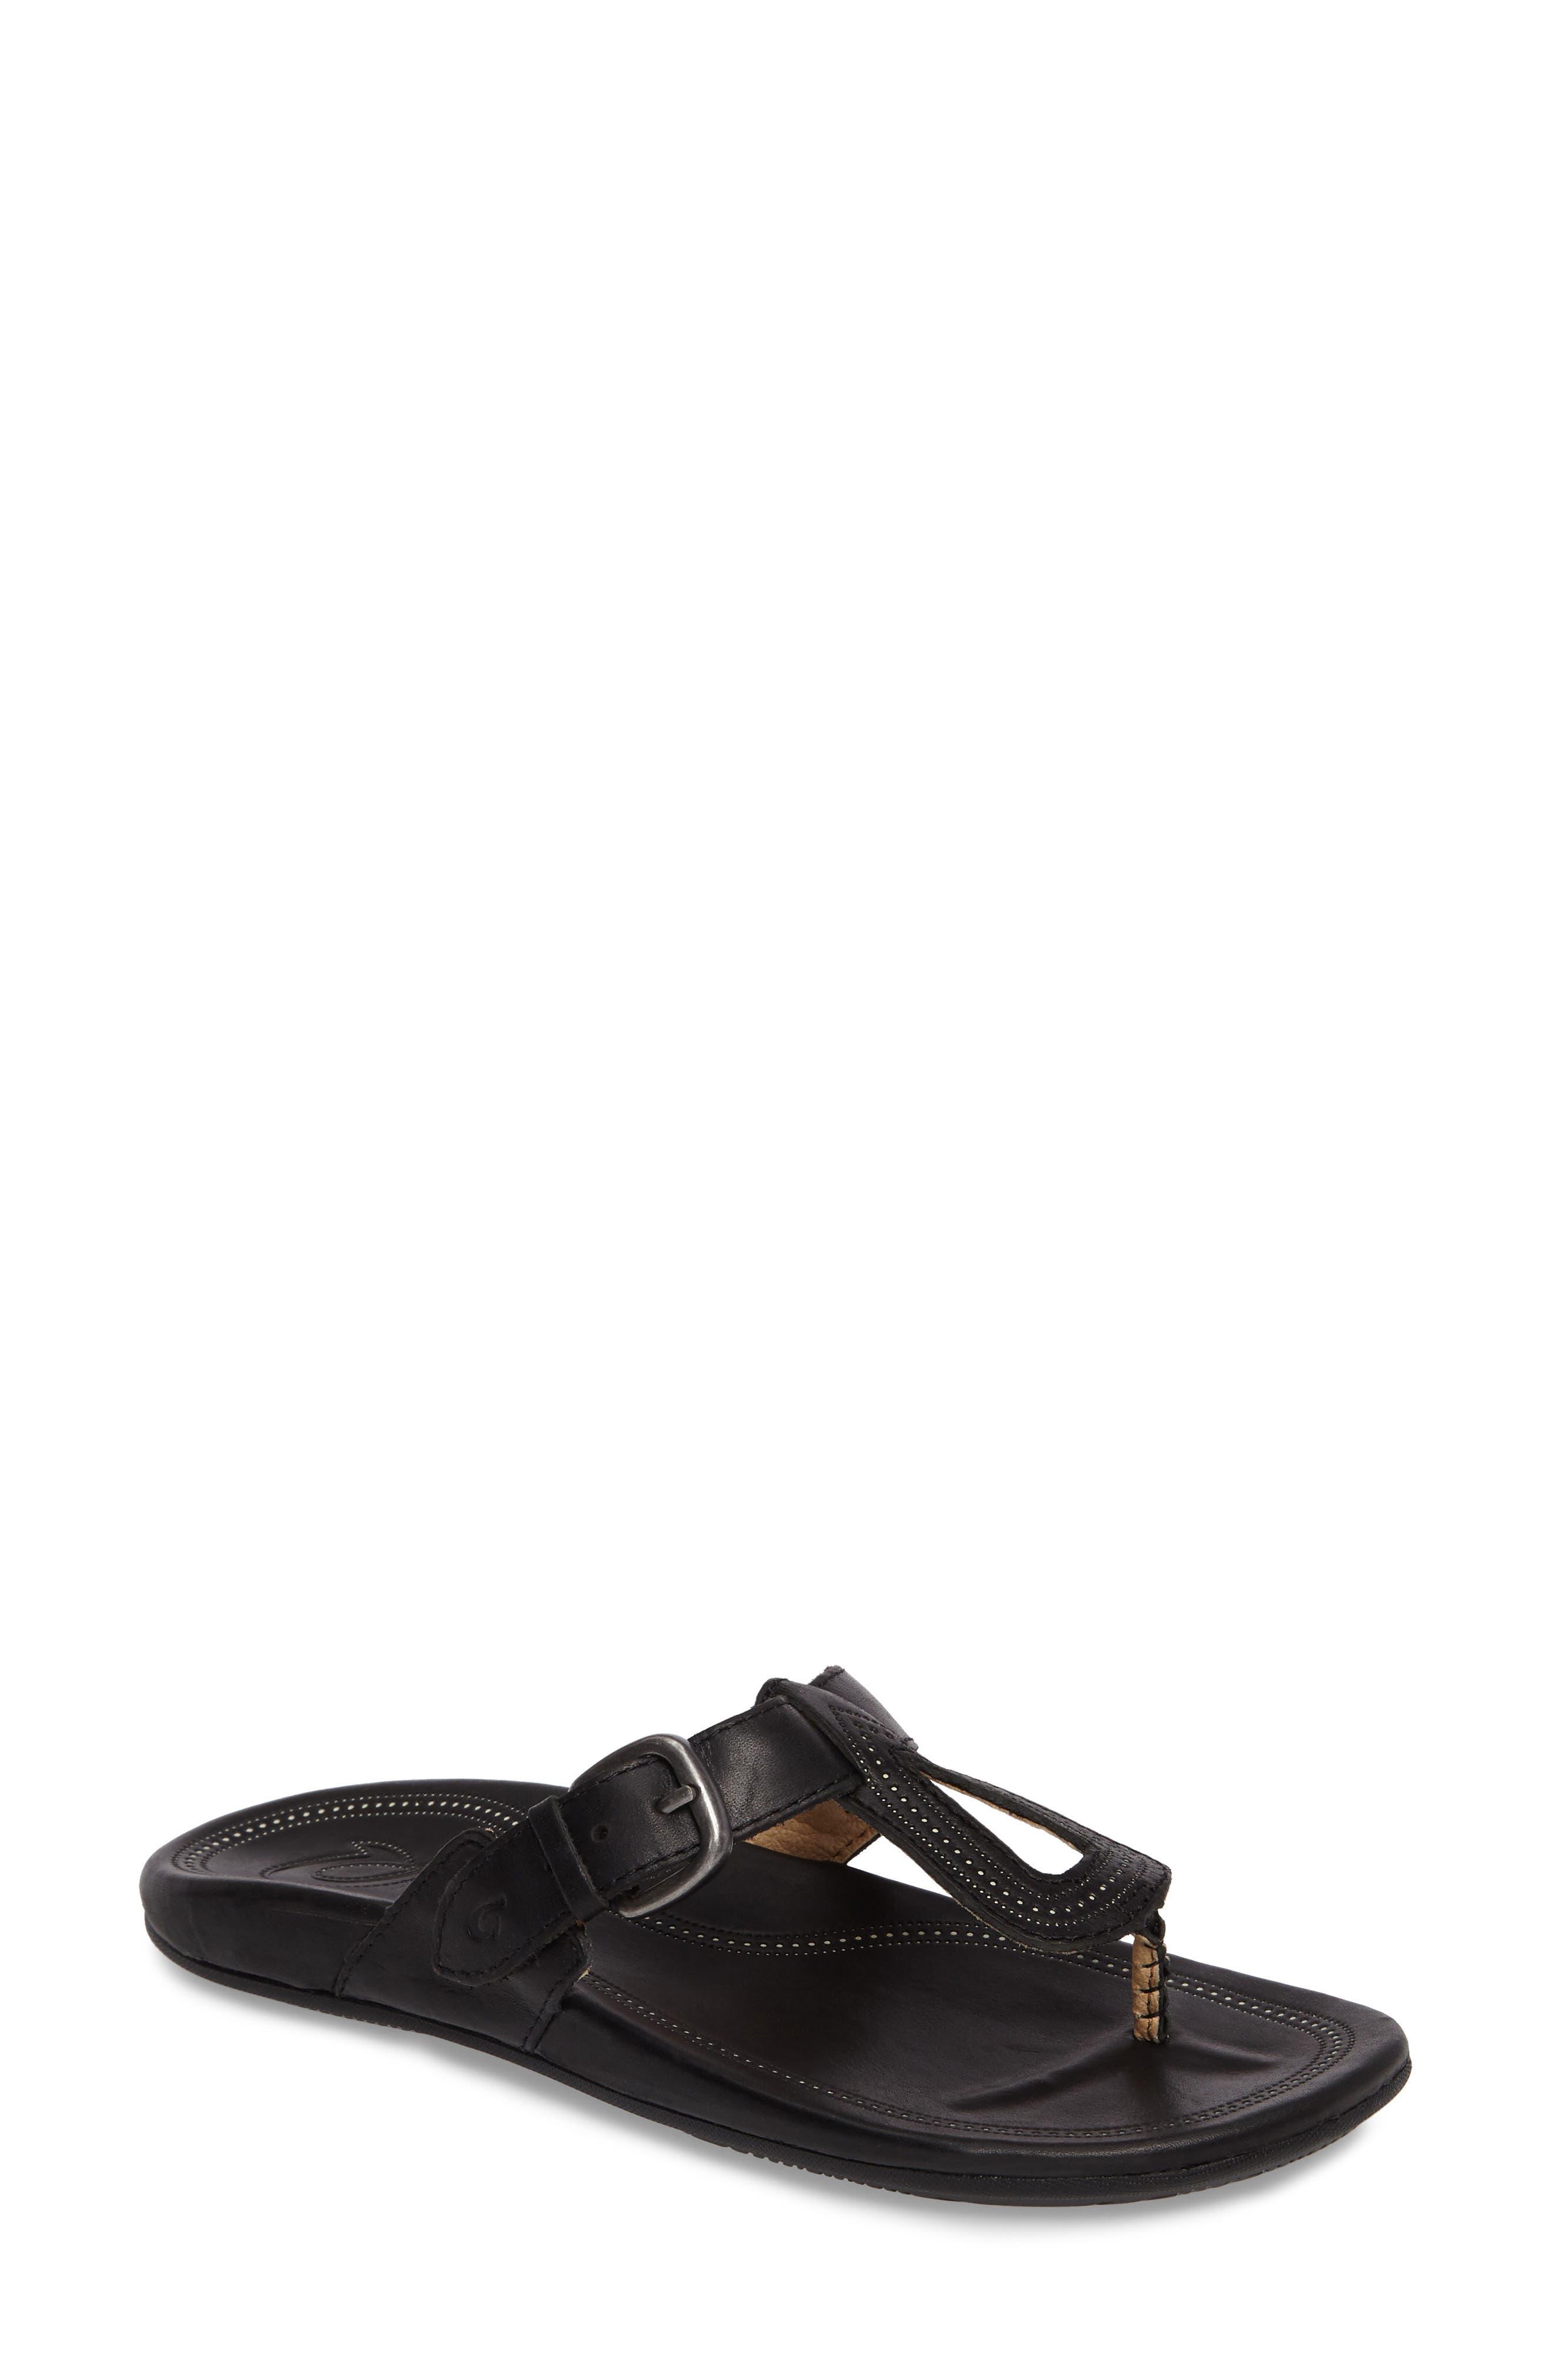 Lanakila Buckle Flip Flop Women),                         Main,                         color, BLACK/ BLACK LEATHER